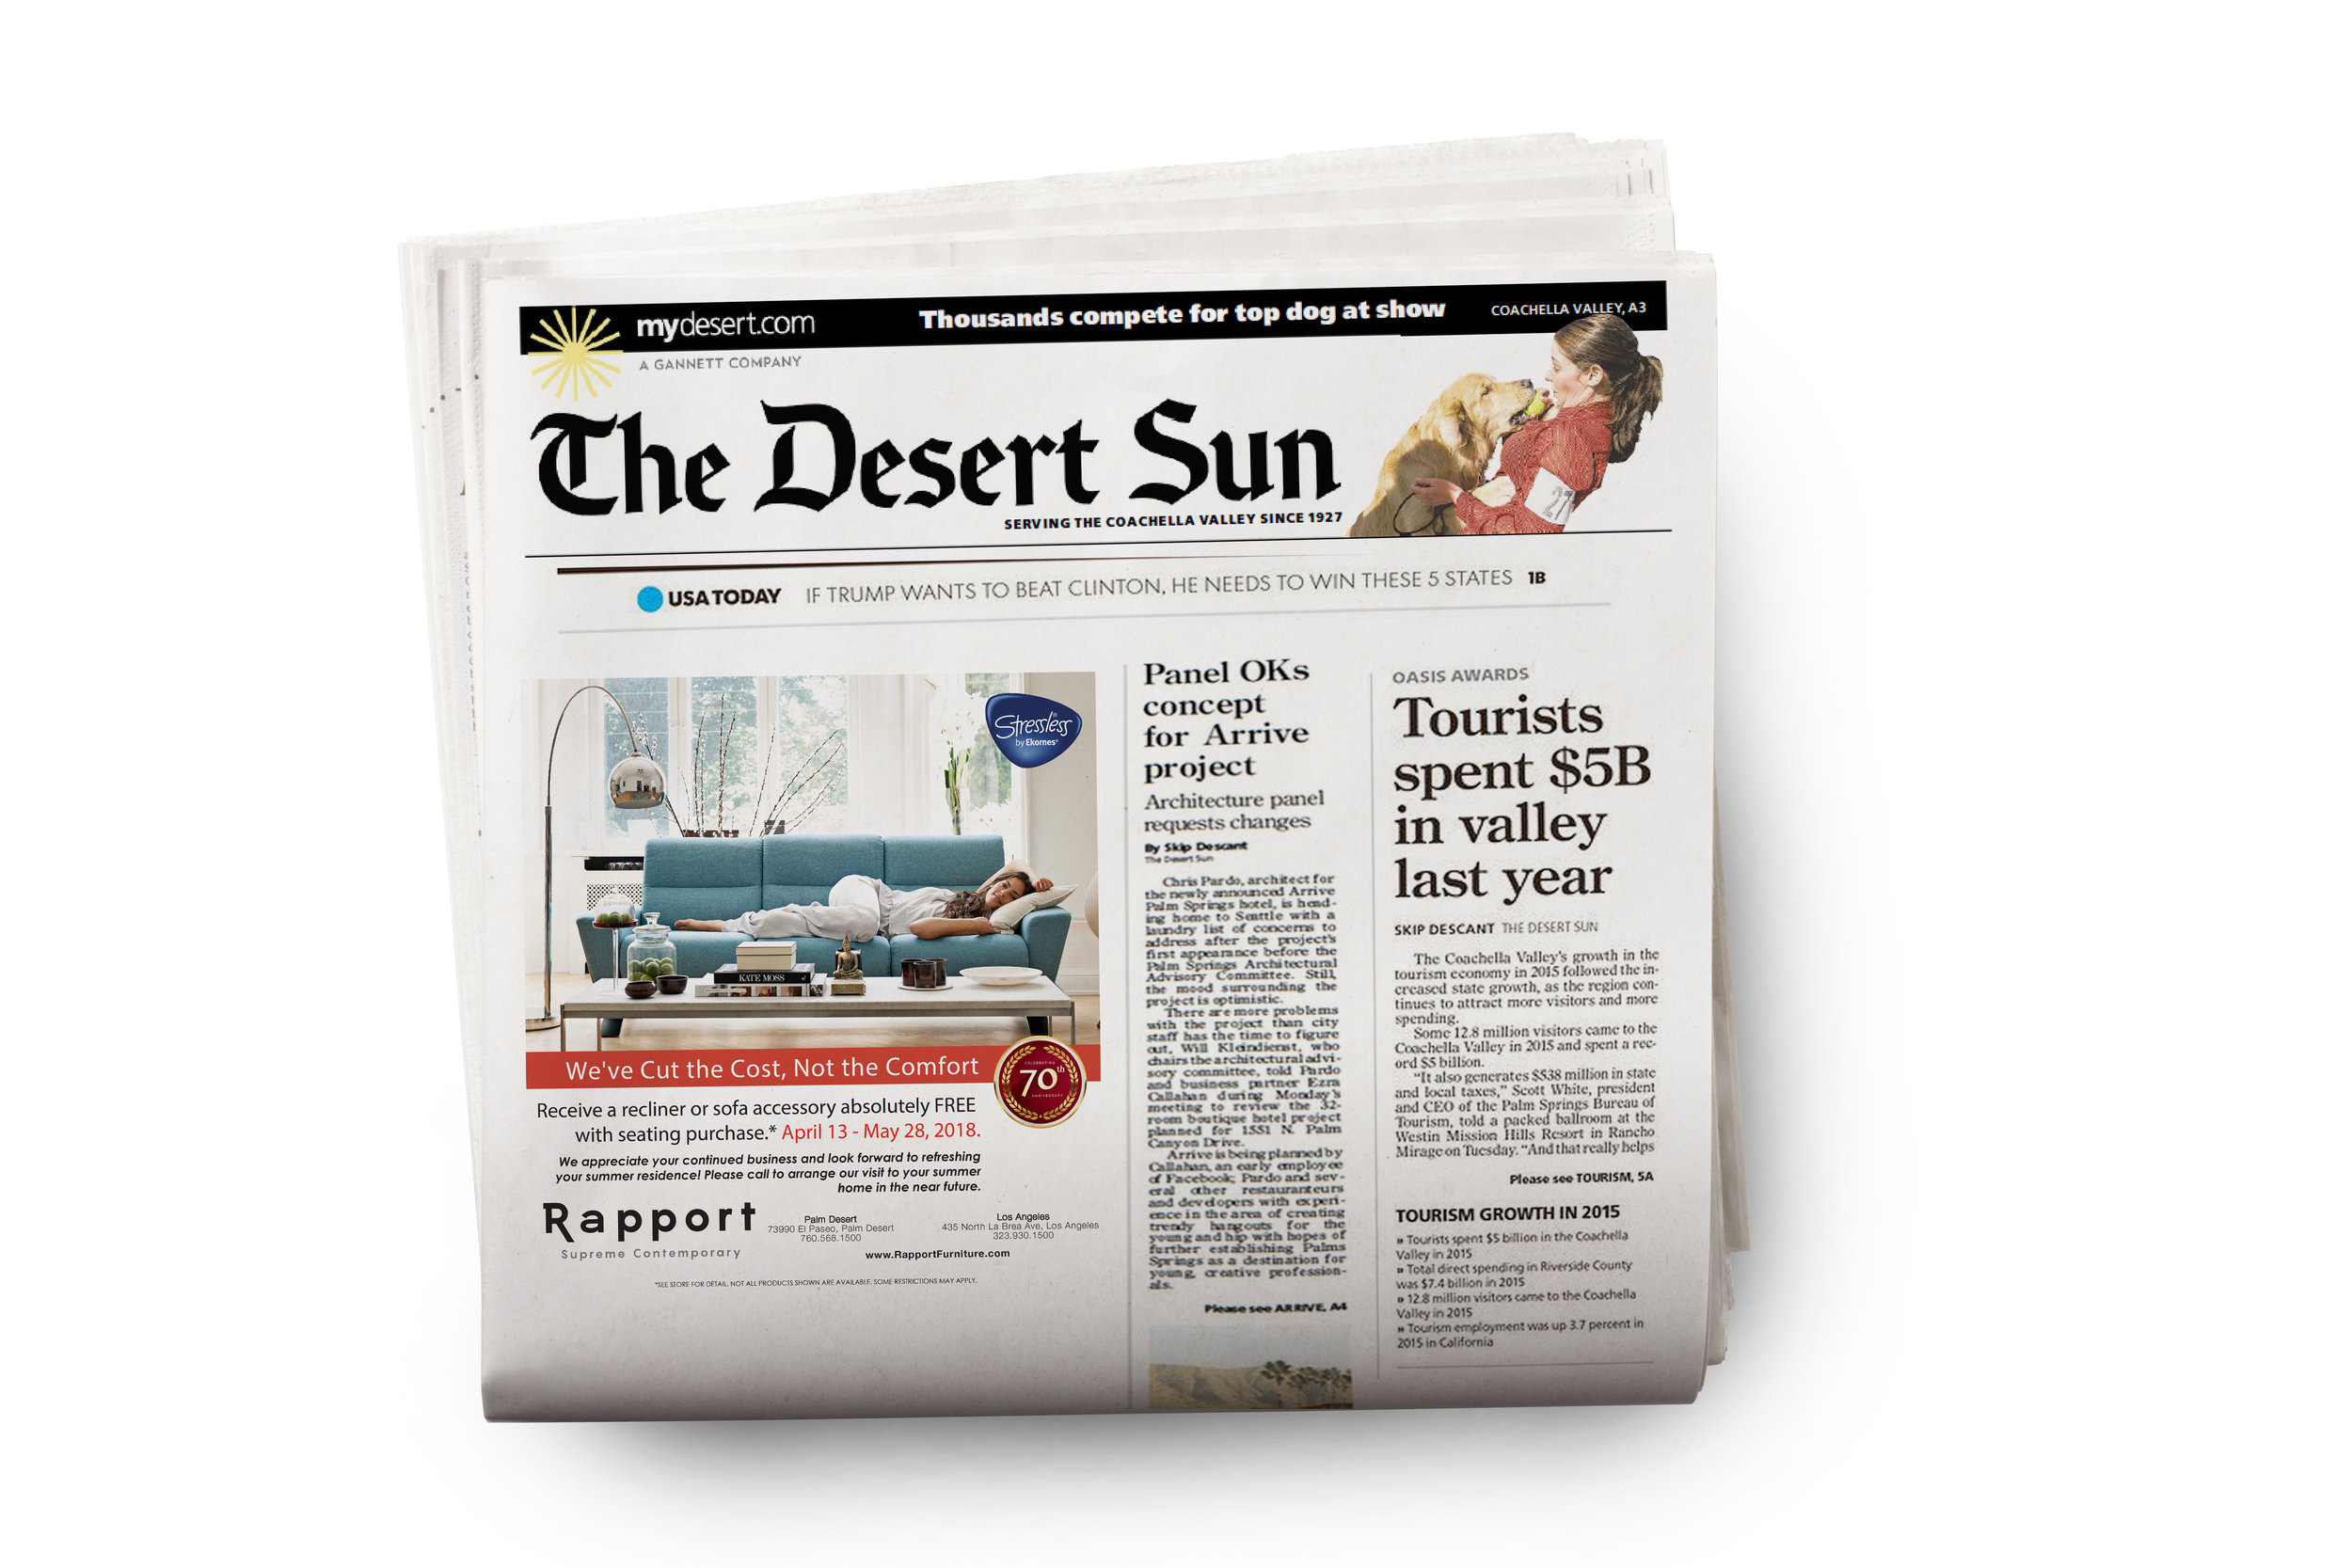 Rapport_DesertSunNewspaper_MOCKUP14.jpg